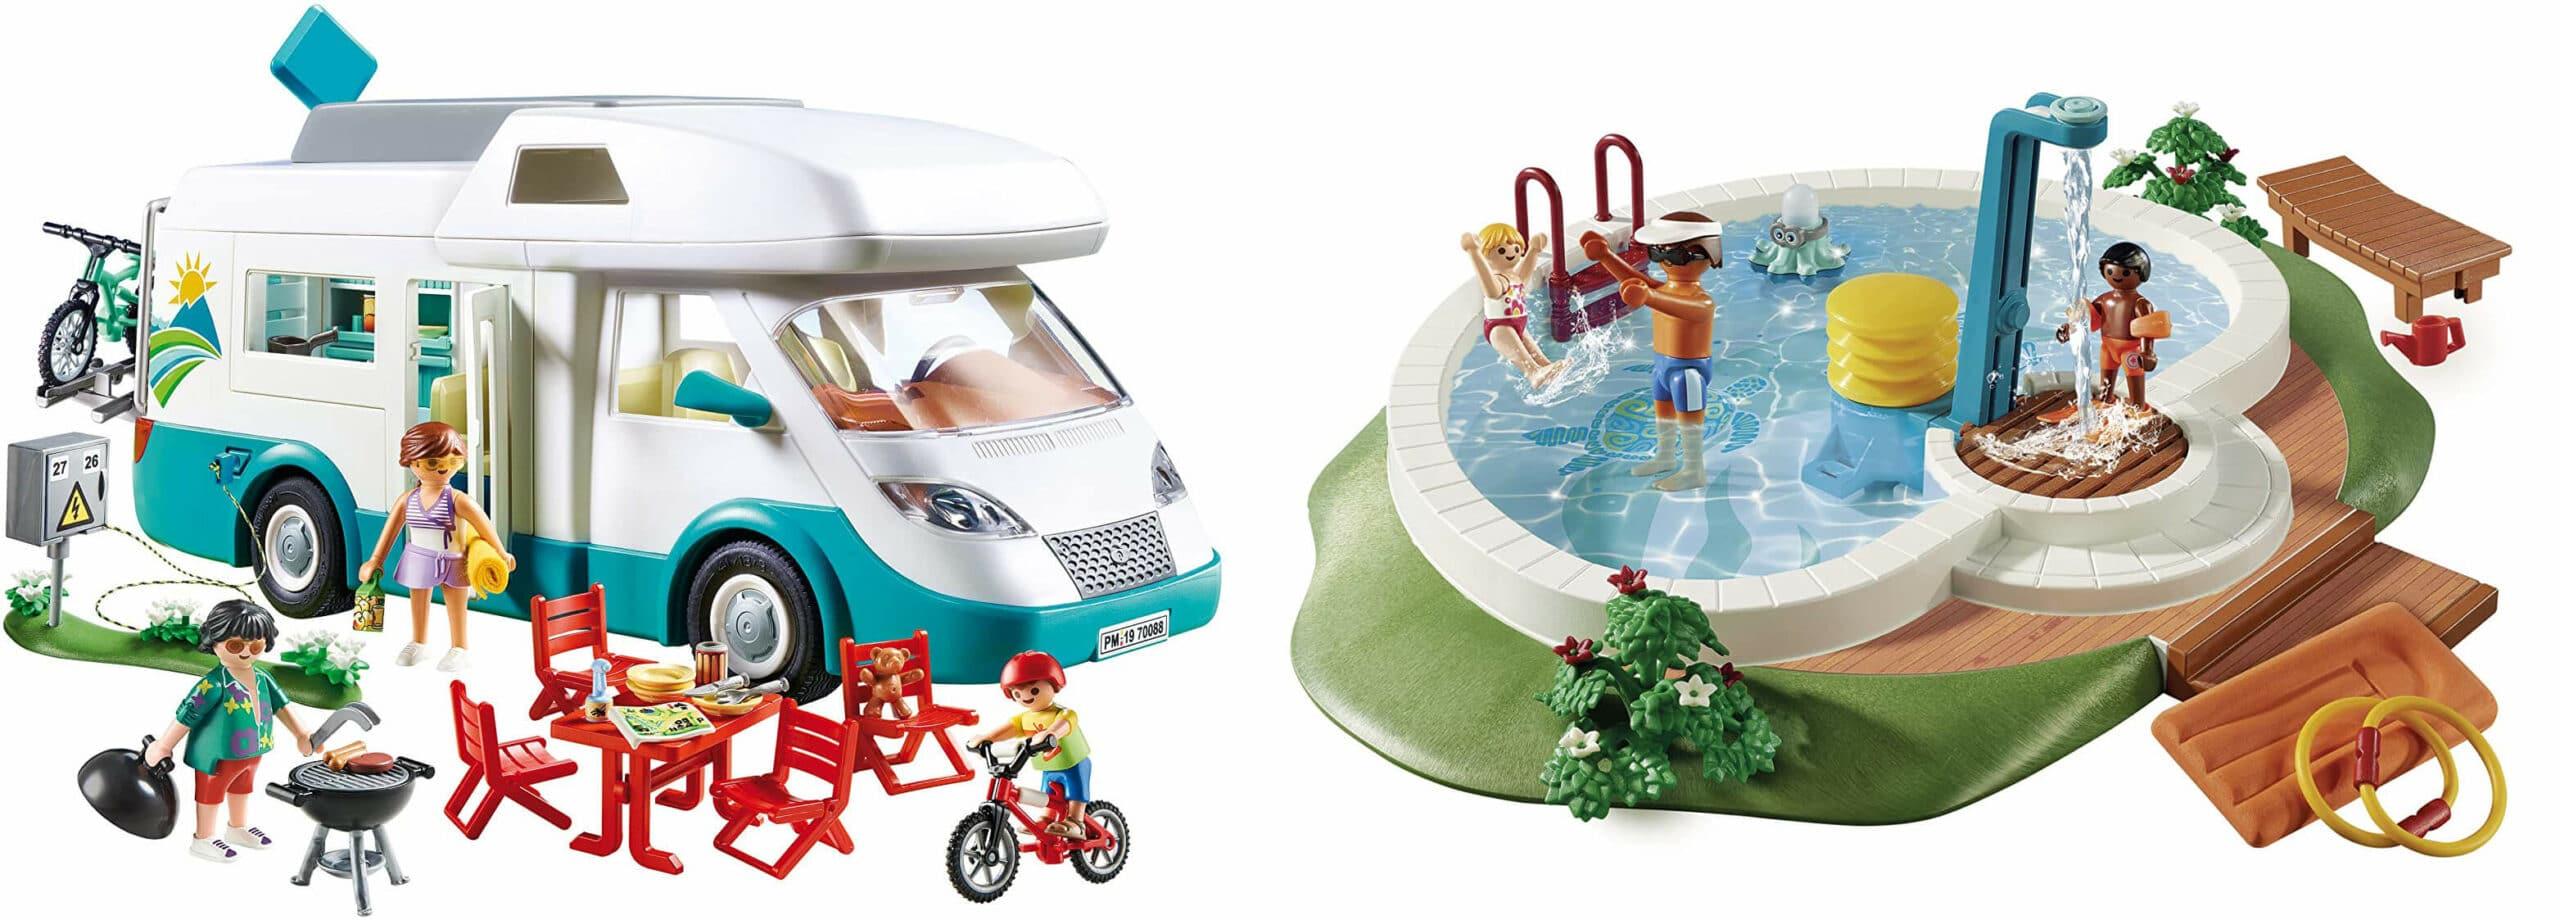 Playmobil Familienurlaub Fun